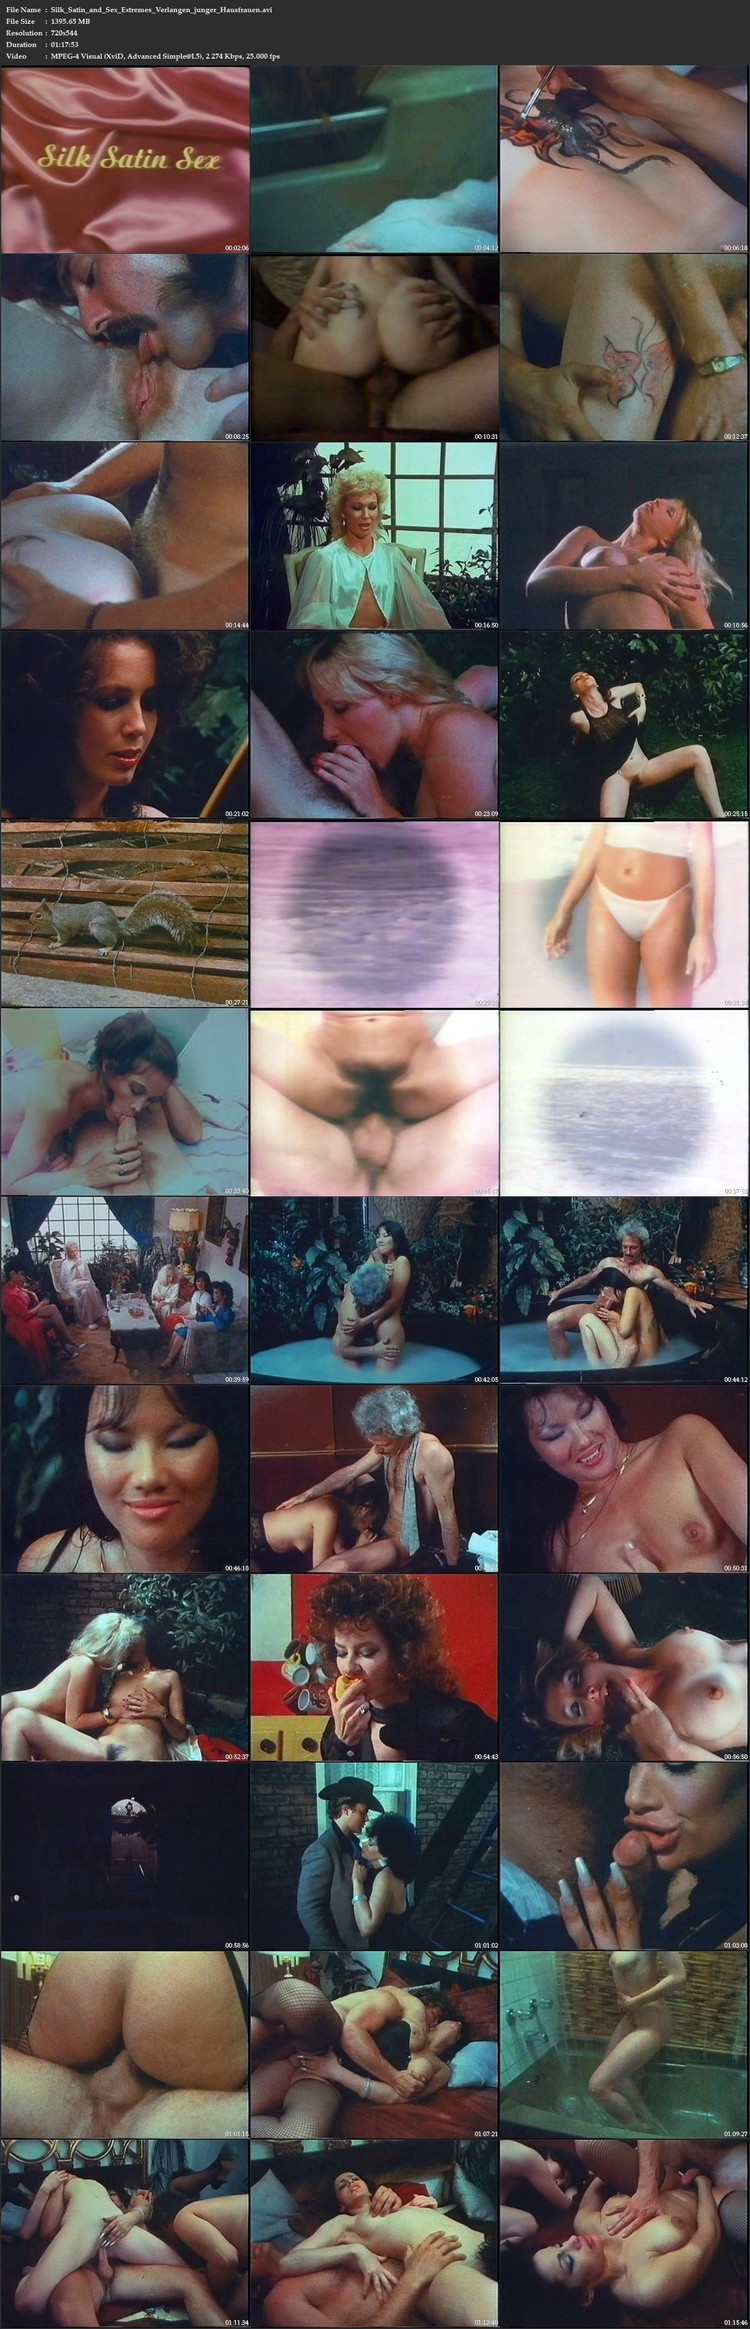 http://ist3-6.filesor.com/pimpandhost.com/1/_/_/_/1/4/i/t/f/4itfX/Silk_Satin_and_Sex_Extremes_Verlangen_junger_Hausfrauen.avi_l.jpg